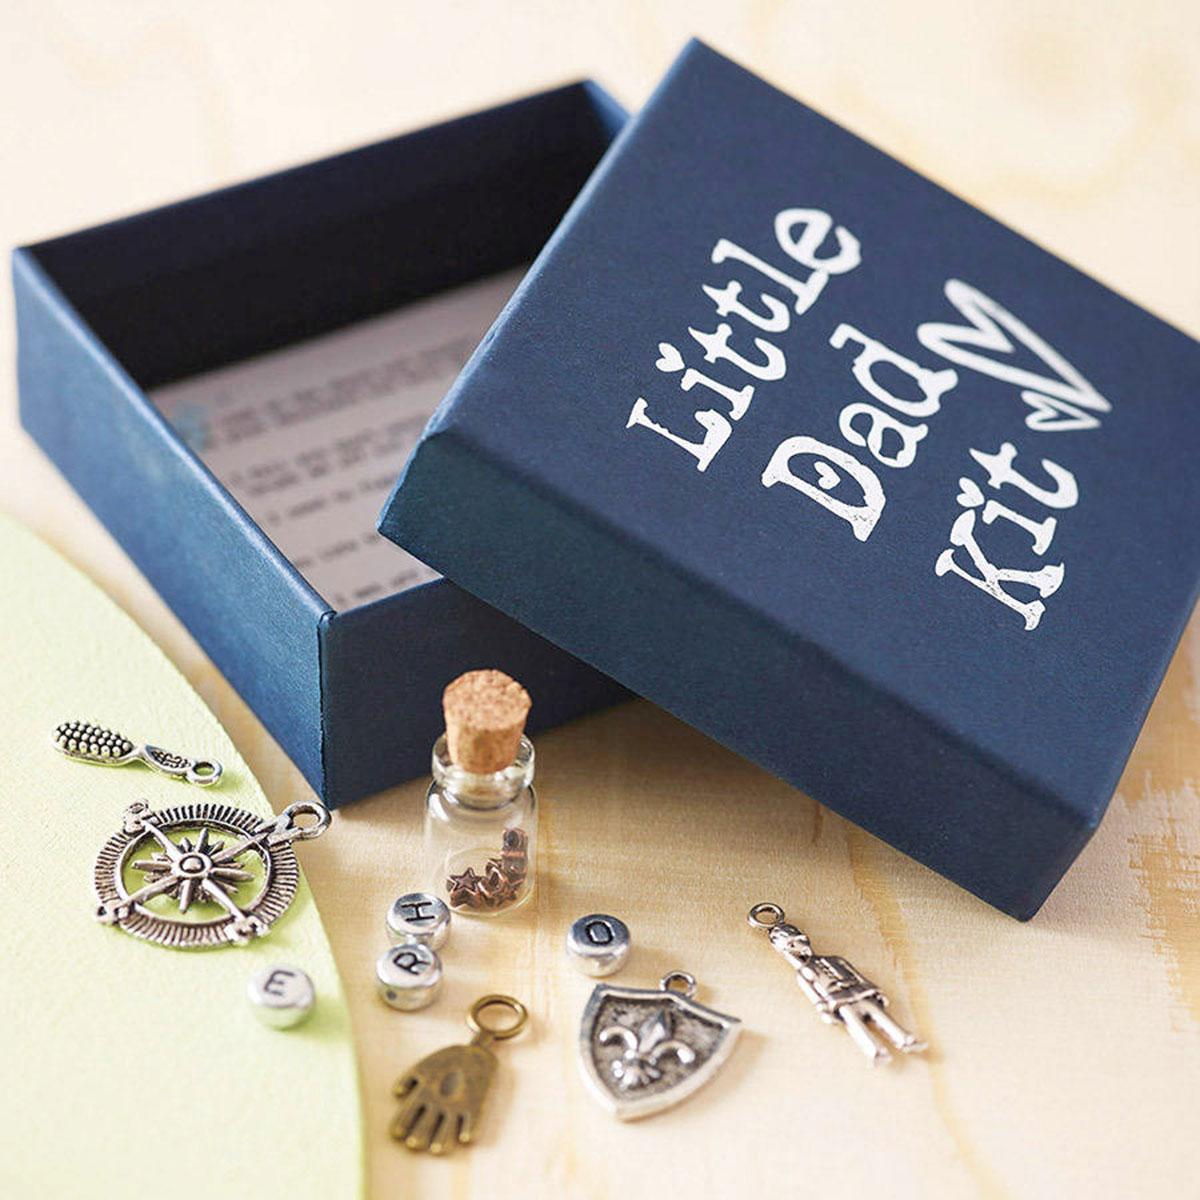 Personalised Little Dad Kit Gettingpersonal Co Uk